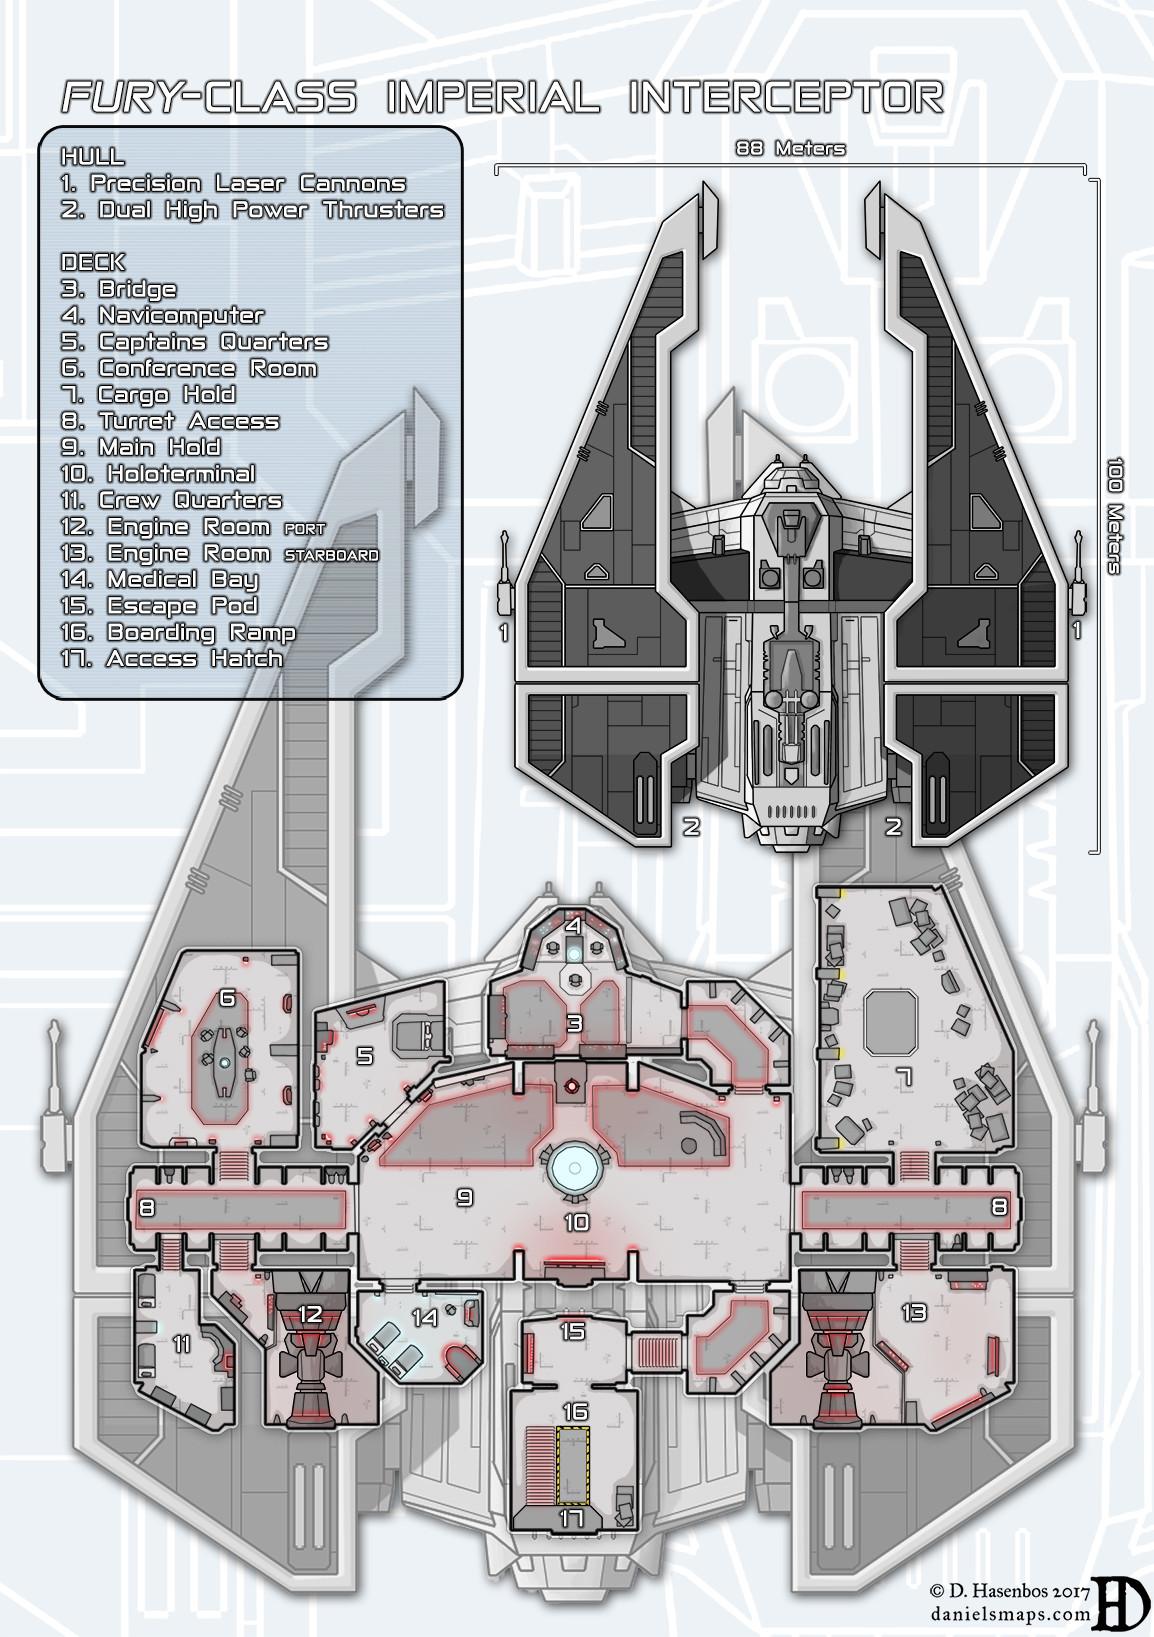 ArtStation - Fury-Class Imperial Interceptor, Daniel Hasenbos